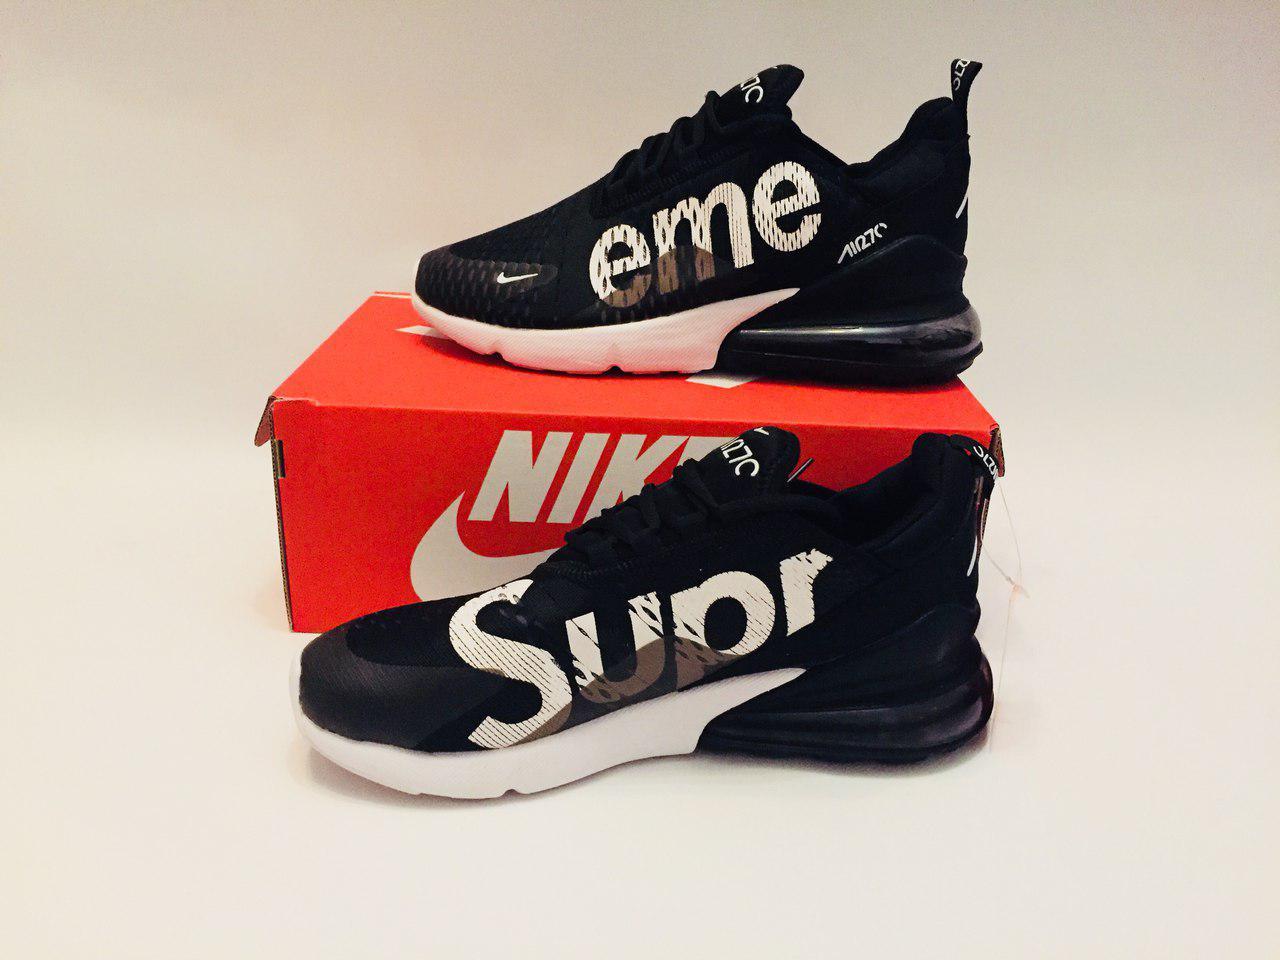 54a25554 Мужские кроссовки Nike Air Max 270 Supreme - Магазин Nike-Shop. Брендовая  спортивная одежда